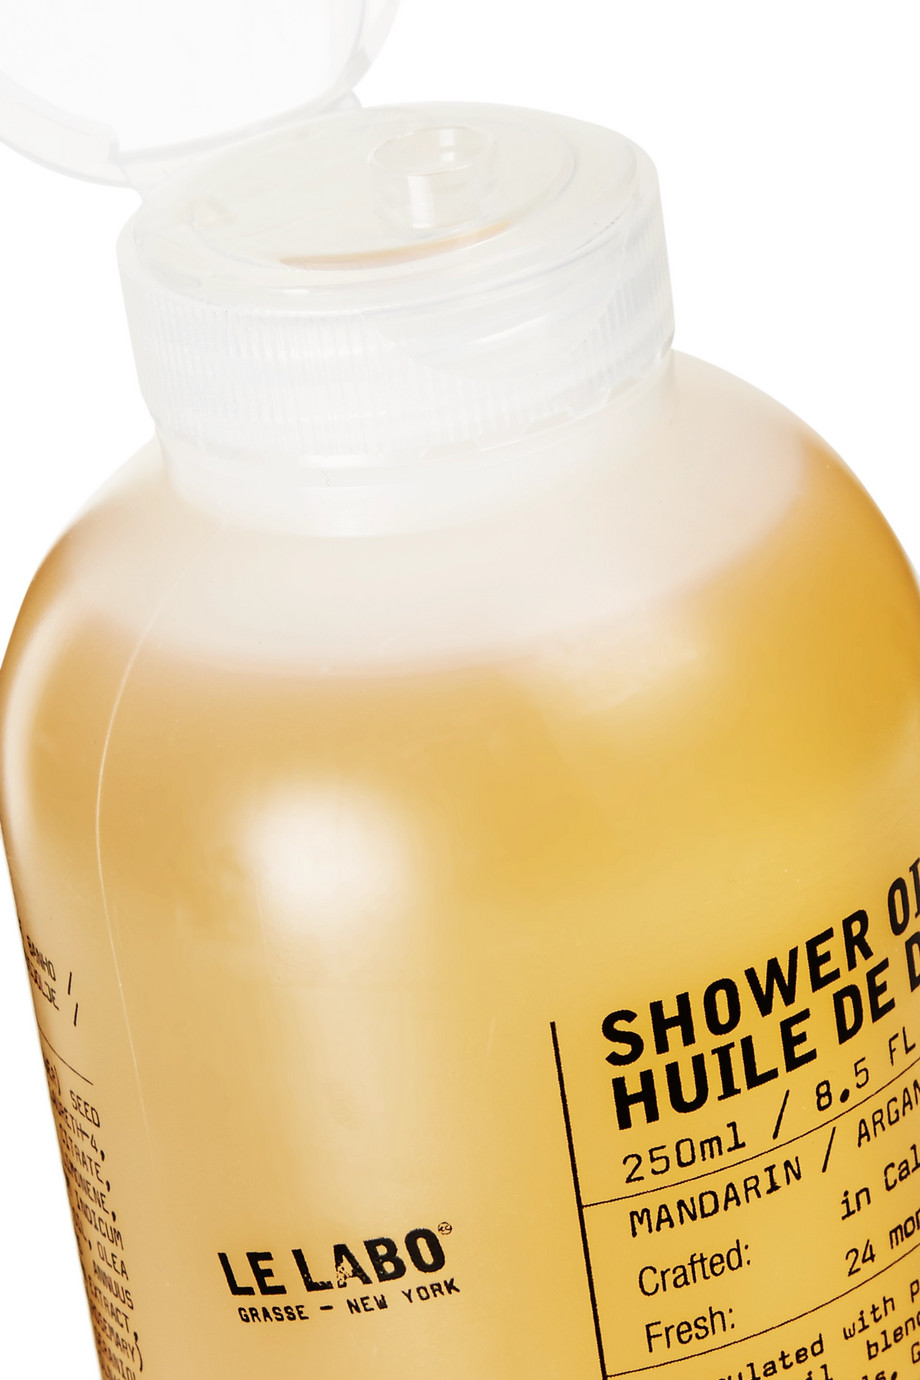 Le Labo Shower Oil, 250ml